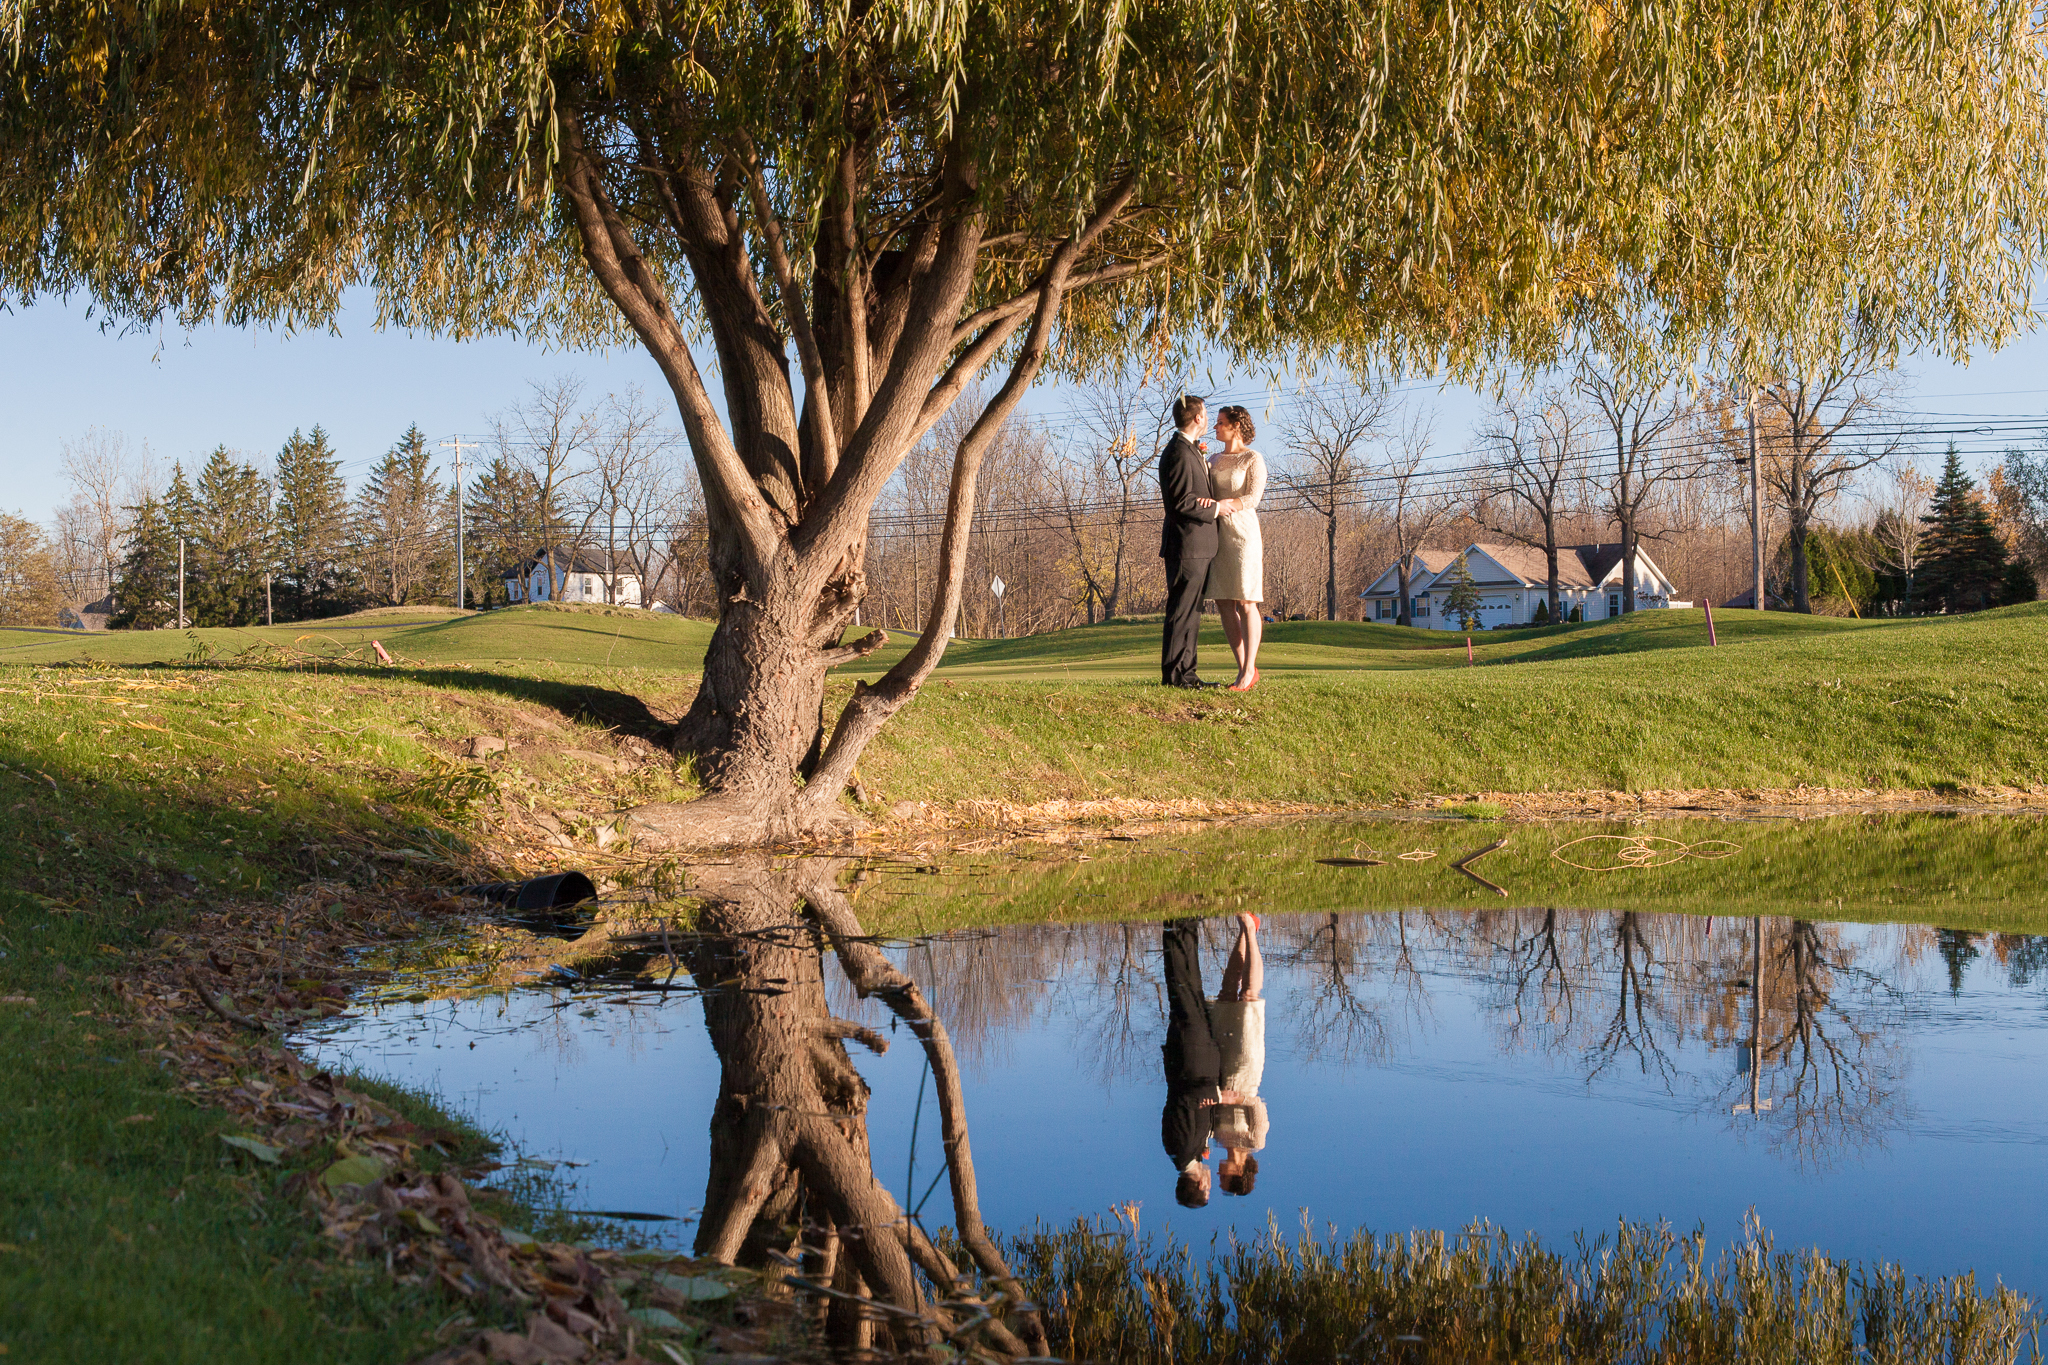 camuglia-whomstudio-chelsea_and_andy-nycphotographer-wedding-brooklyn-buffalo-timberlodge-042-0293.jpg